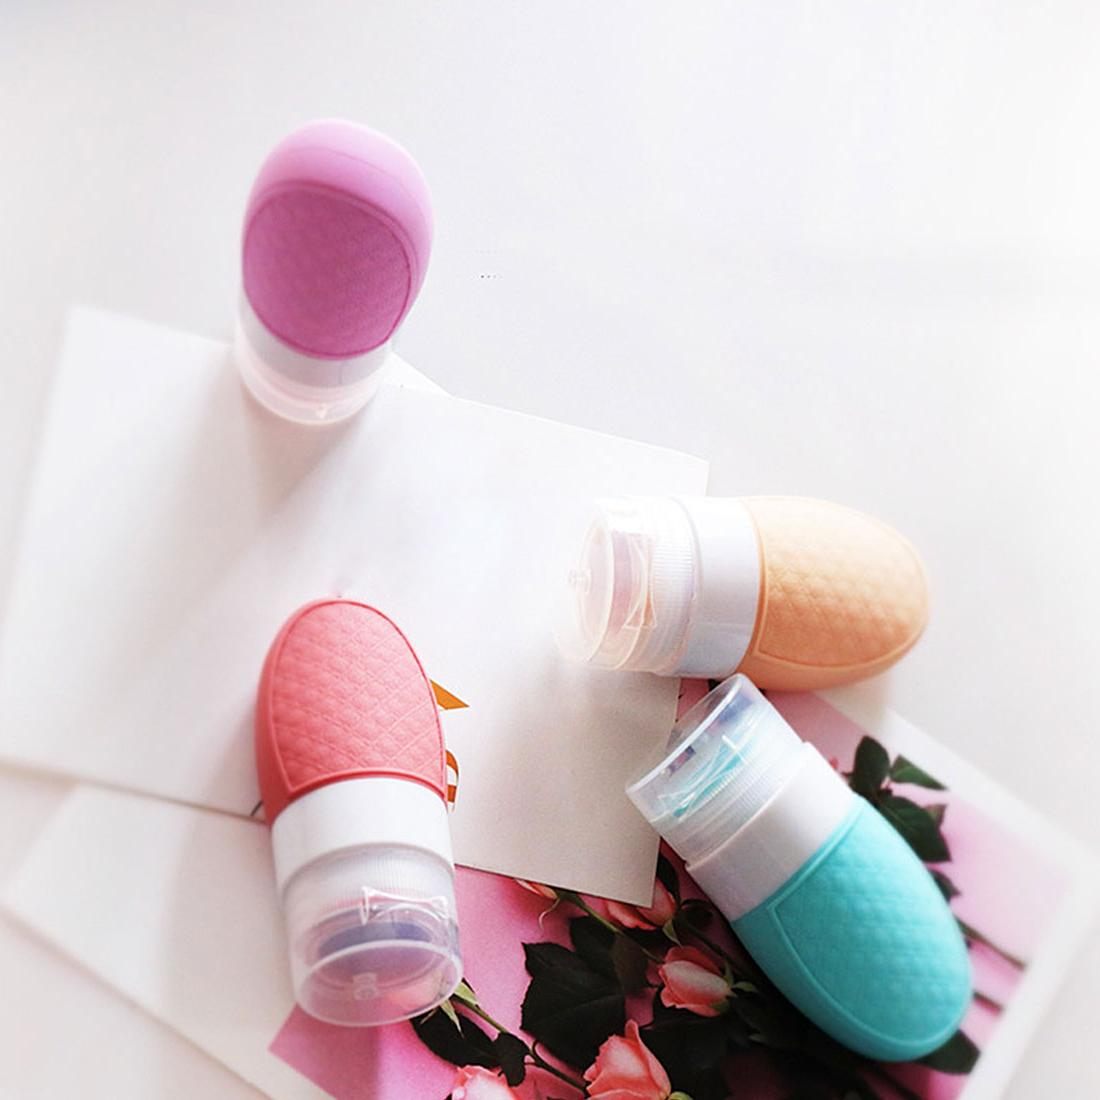 Portable thickening skin emulsion squeeze bottle travel bottle